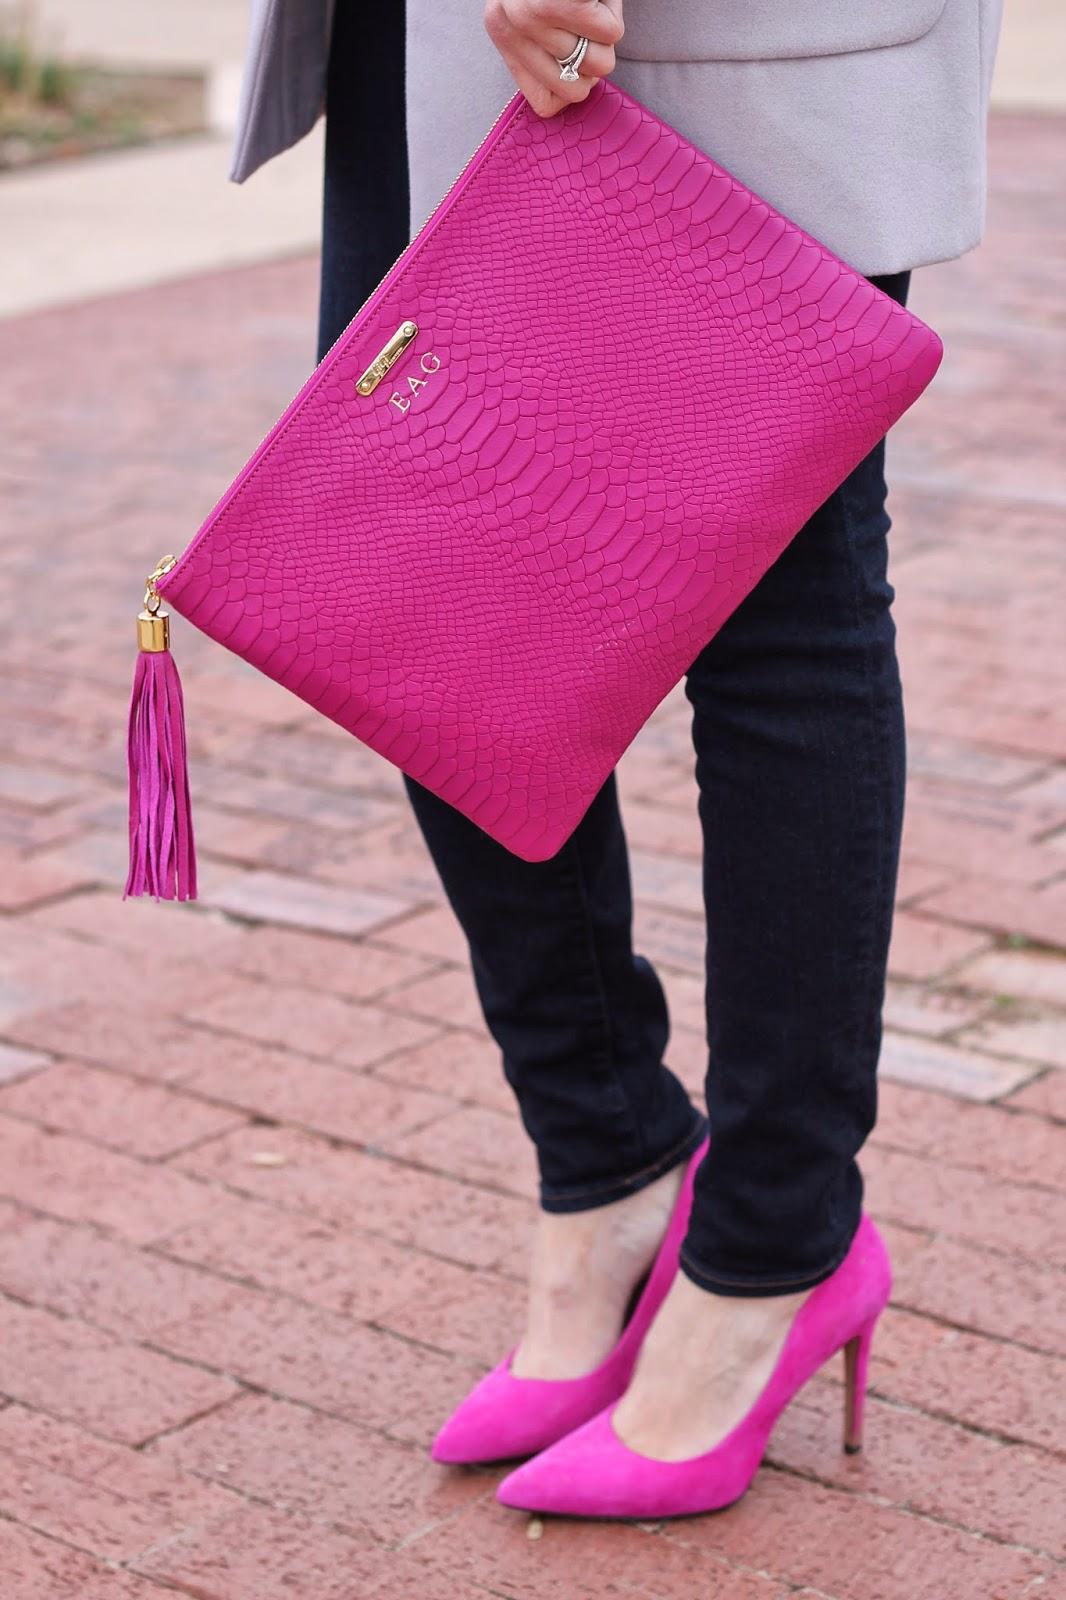 www.thesweetestthingblog.com, The Sweetest Thing Blog, Emily Gemma, Gigi New York clutch, Uber clutch in Magenta, gray sweater, jbrand jeans, jbrand denim, crystal necklace, jcrew necklace, jcrew inspired necklace, forever 21 sunglasses, mac lipstick, pinterest fashion, winter pinterest fashion, pinterest pink heels gray sweater, fuschia pumps, fuschia heels, gold michael kors watch, gigi new york bag